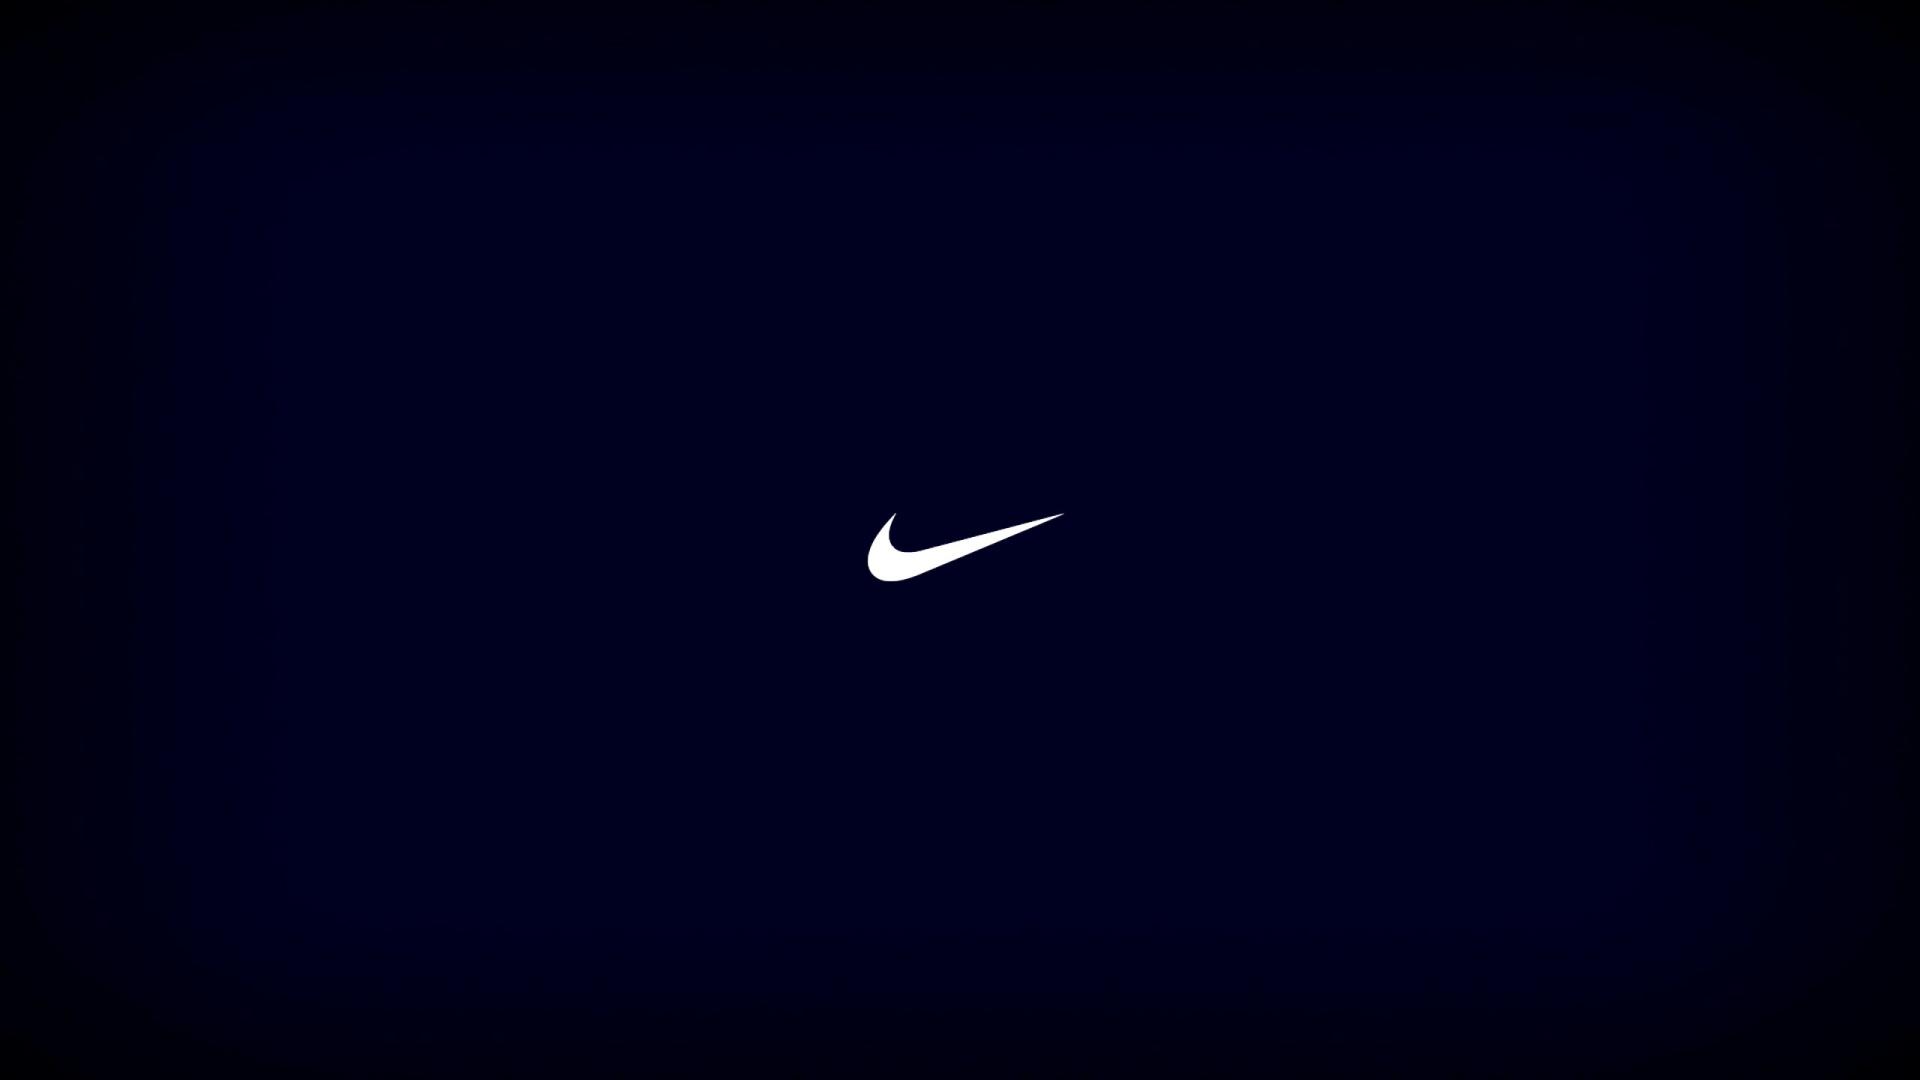 Nike HD wallpaper 1920x1080 54083 1920x1080